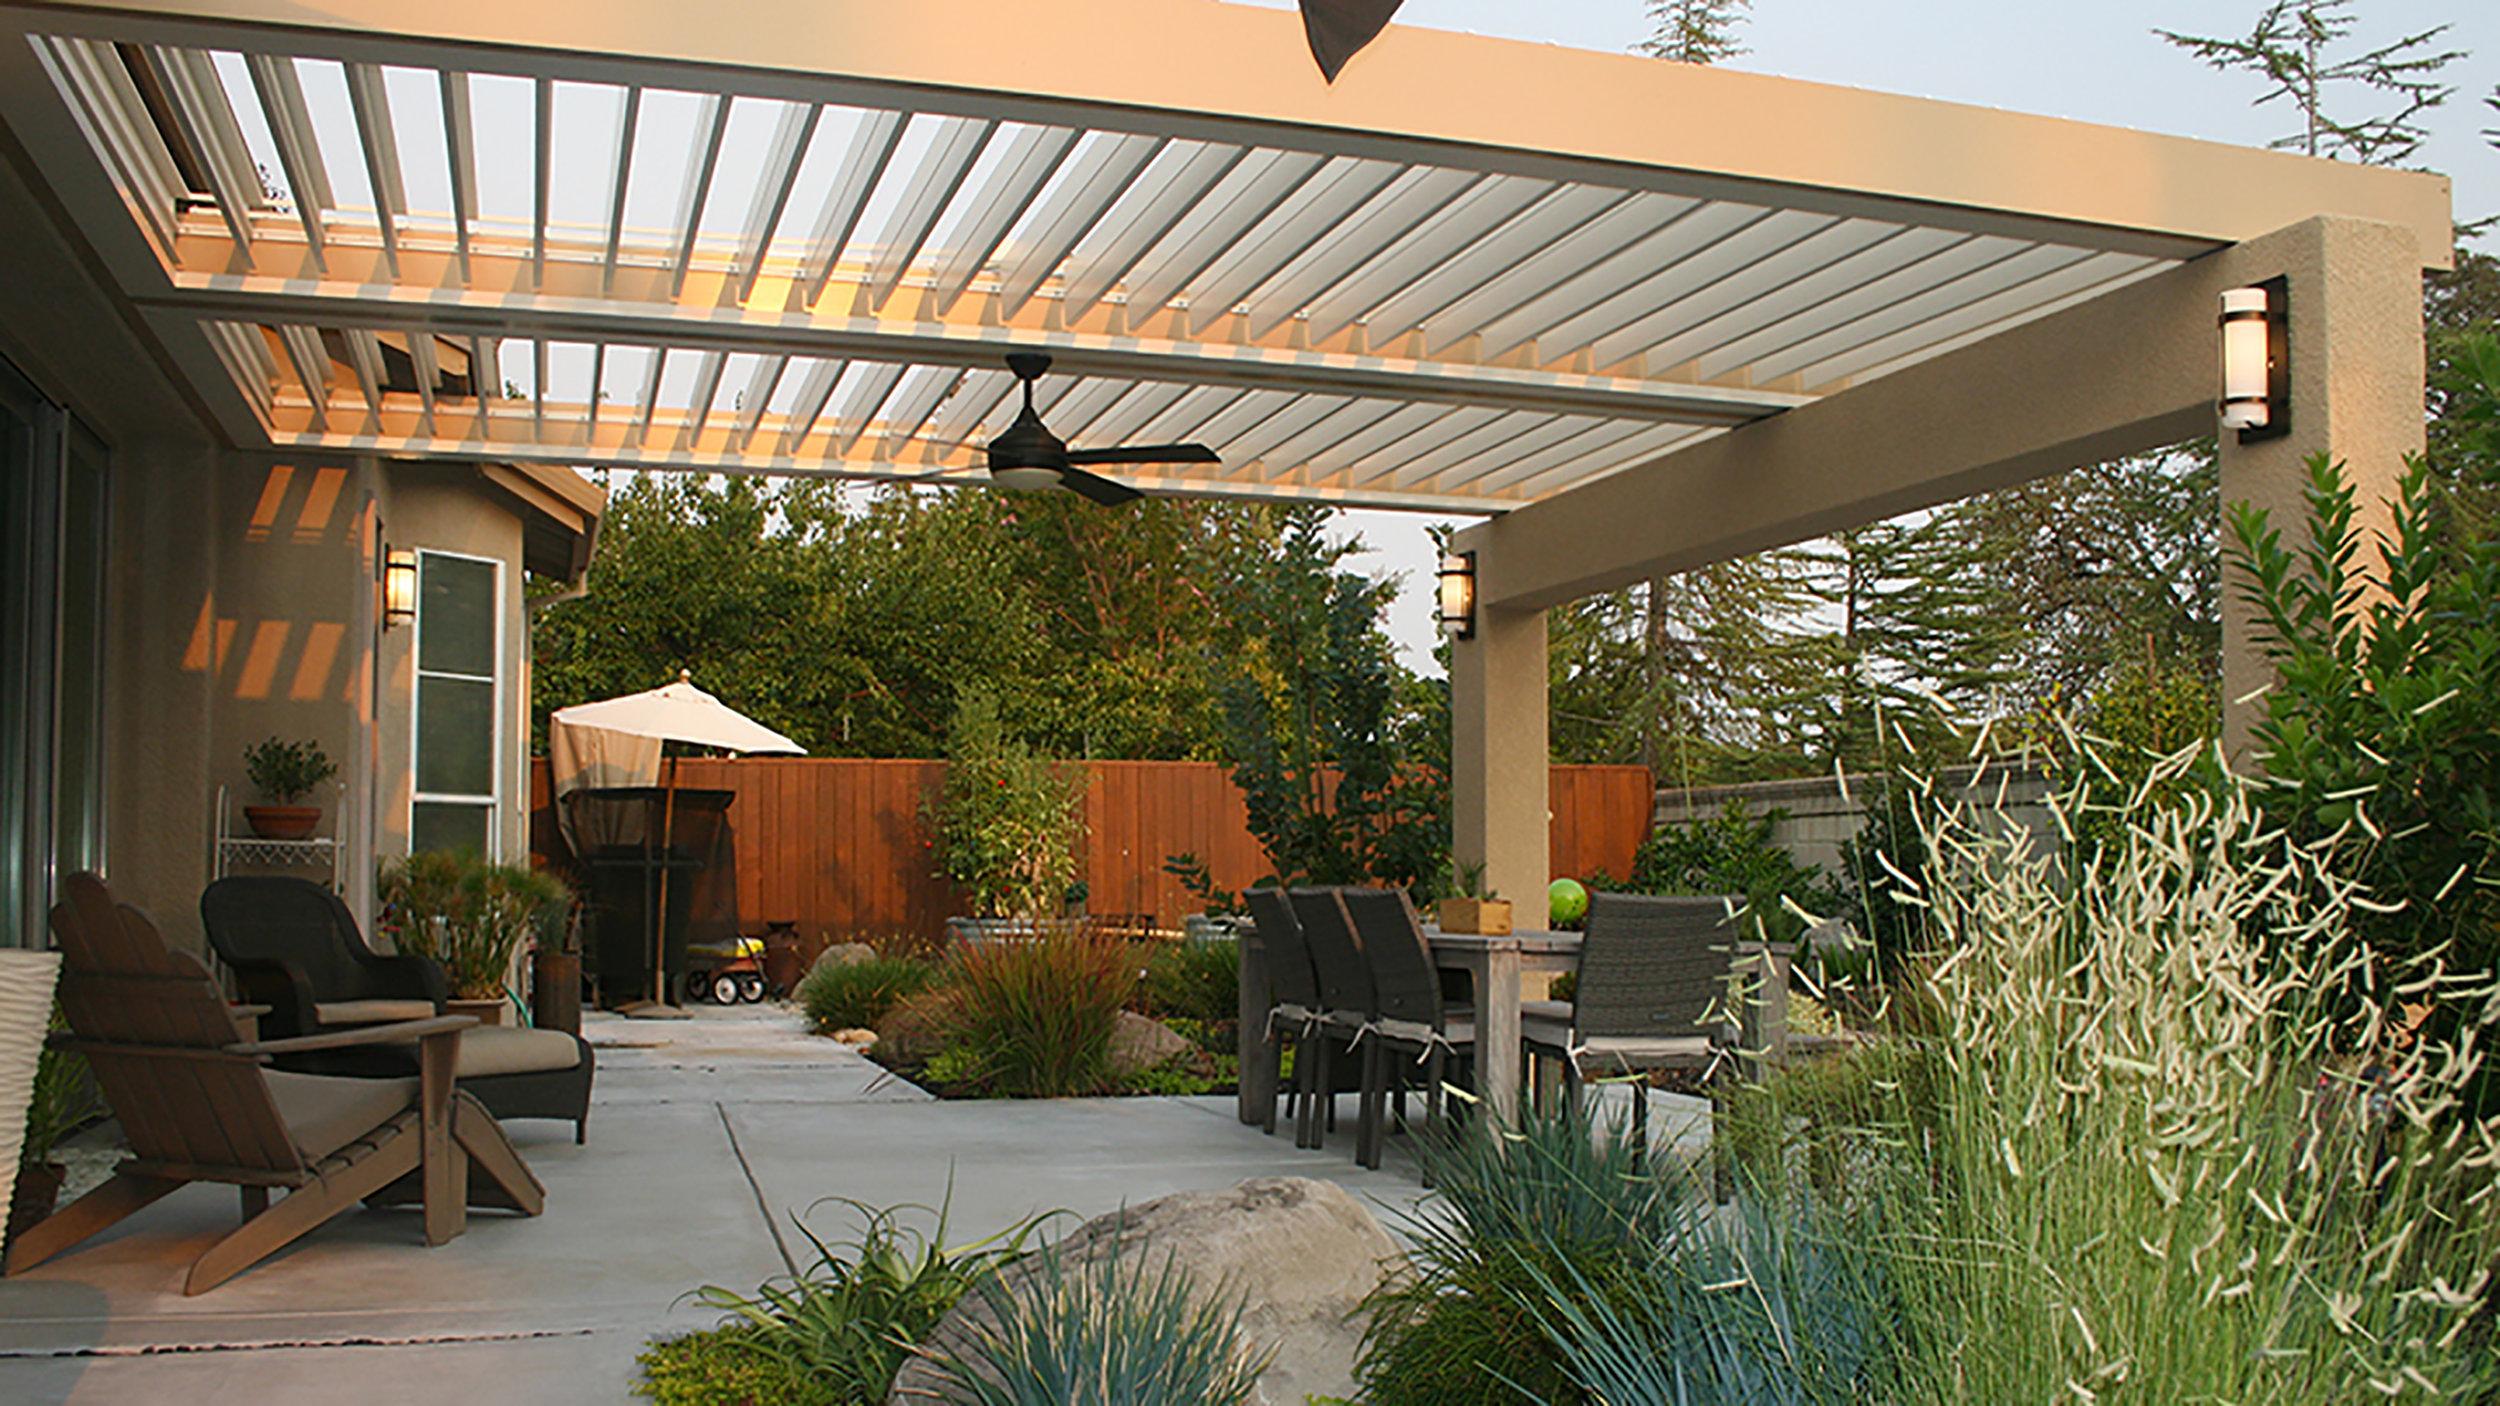 Residential-outdoor dining and living under pergola.jpg